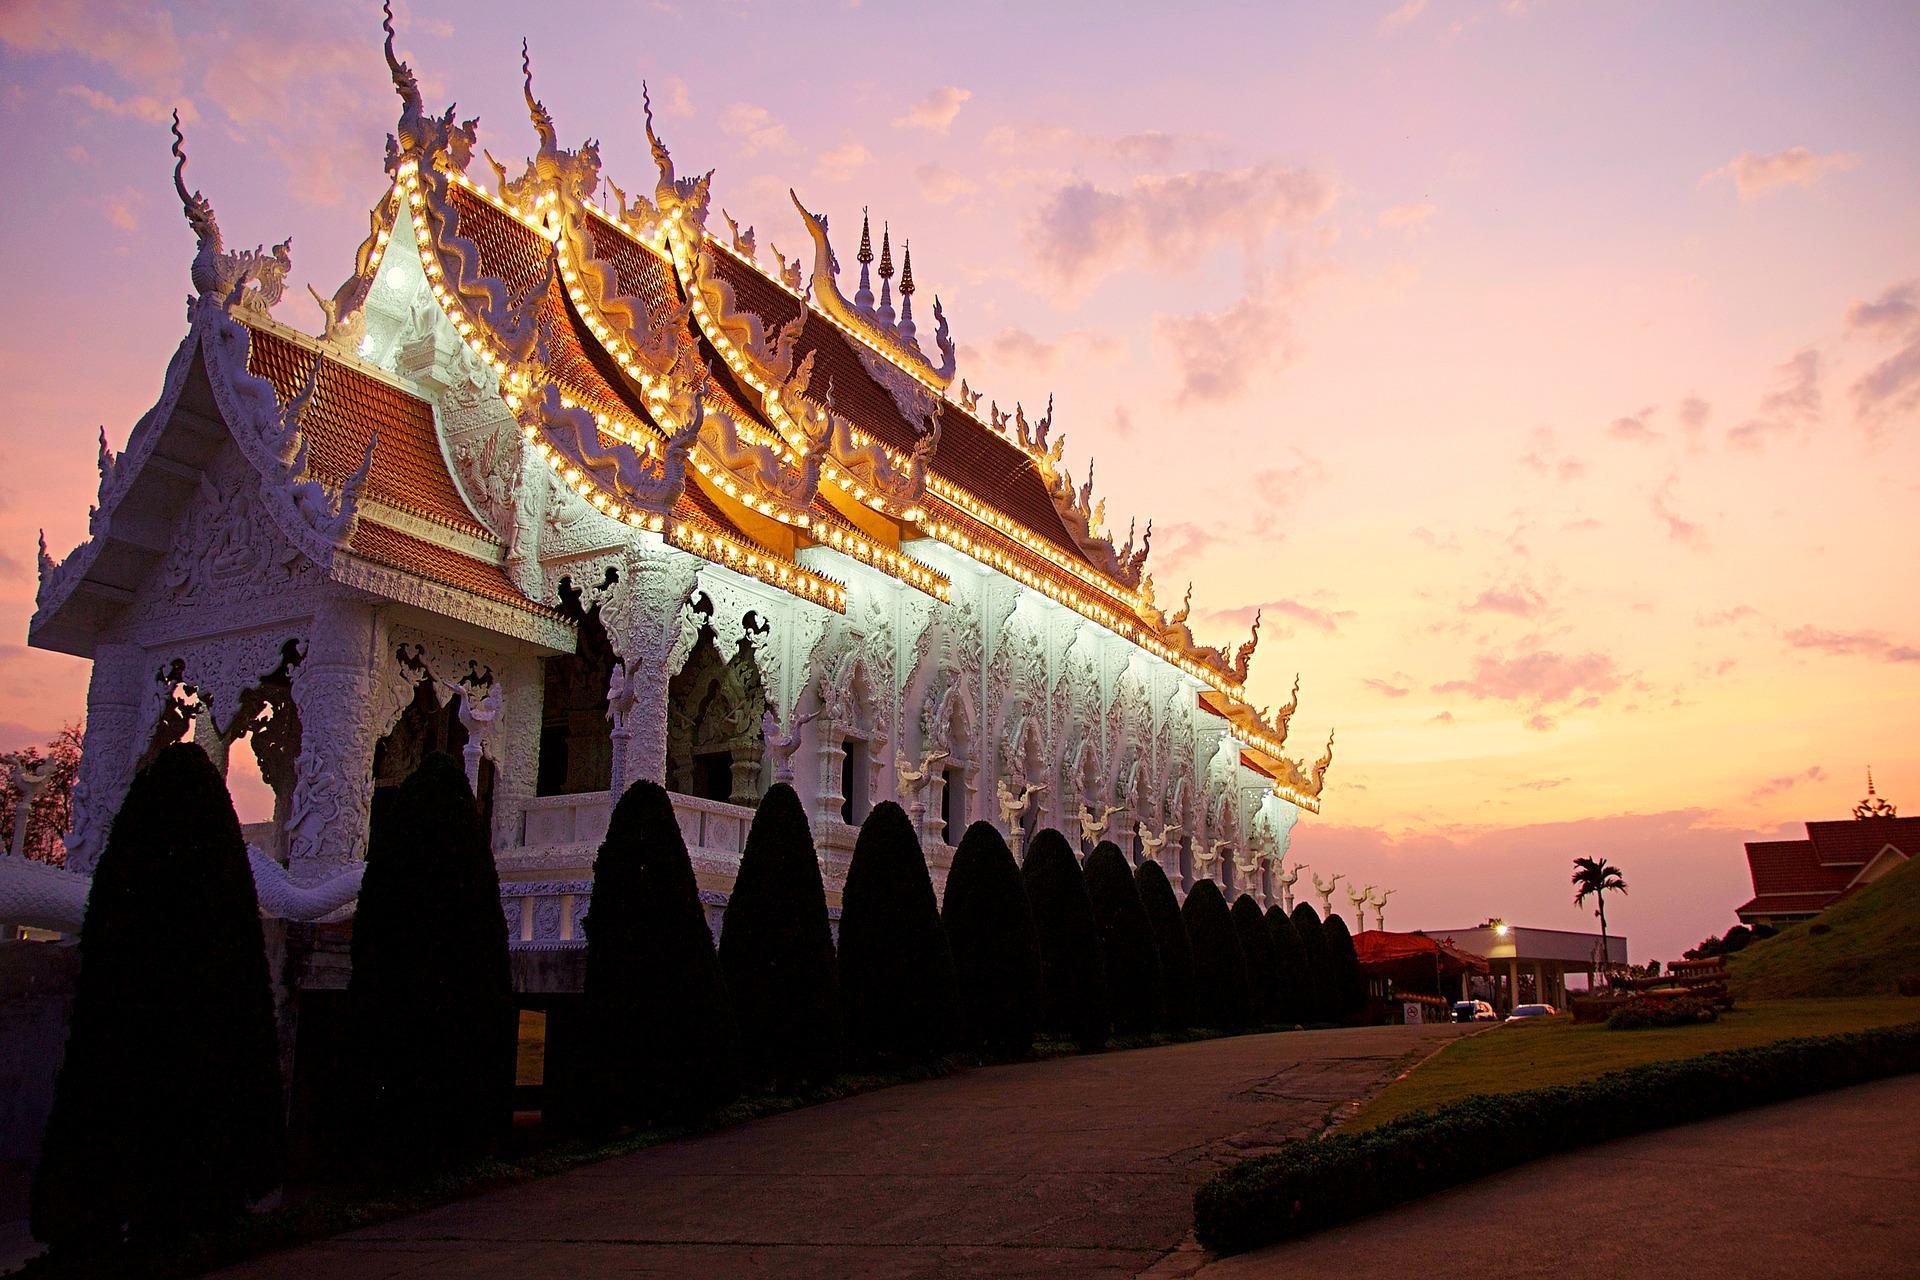 /optitravel/online/www/layout22/single_product.php?pkt_id=149&Produto=Bangkok, Maravilhas do Norte (Regular) & Koh Samui&destino=TAILÂNDIA